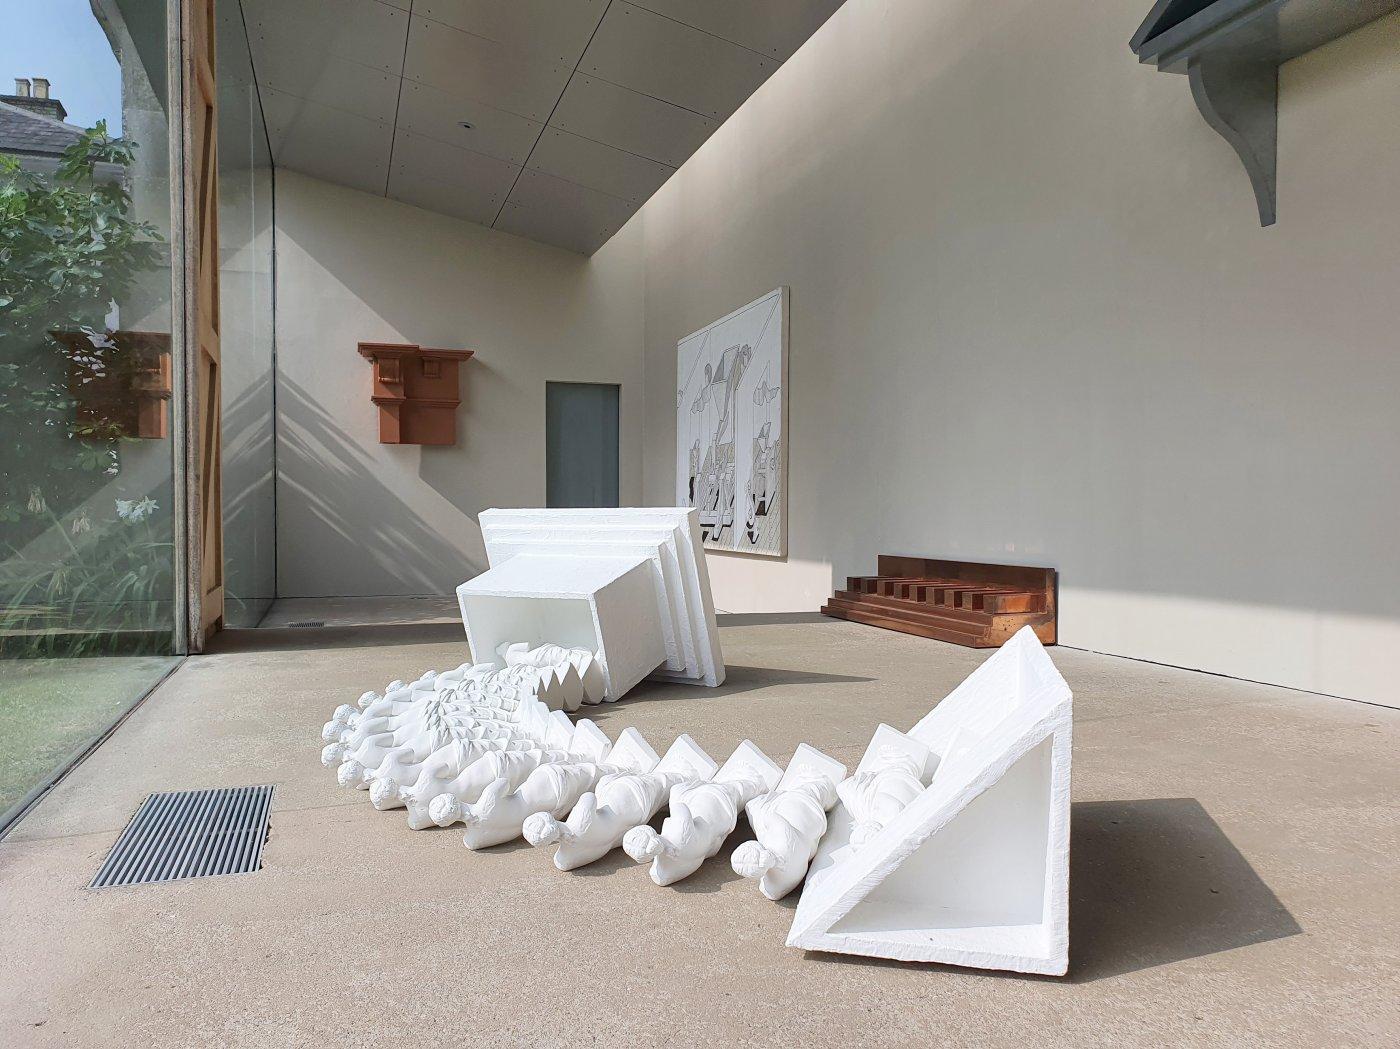 New Art Centre Edward Allington Nika Neelova 2